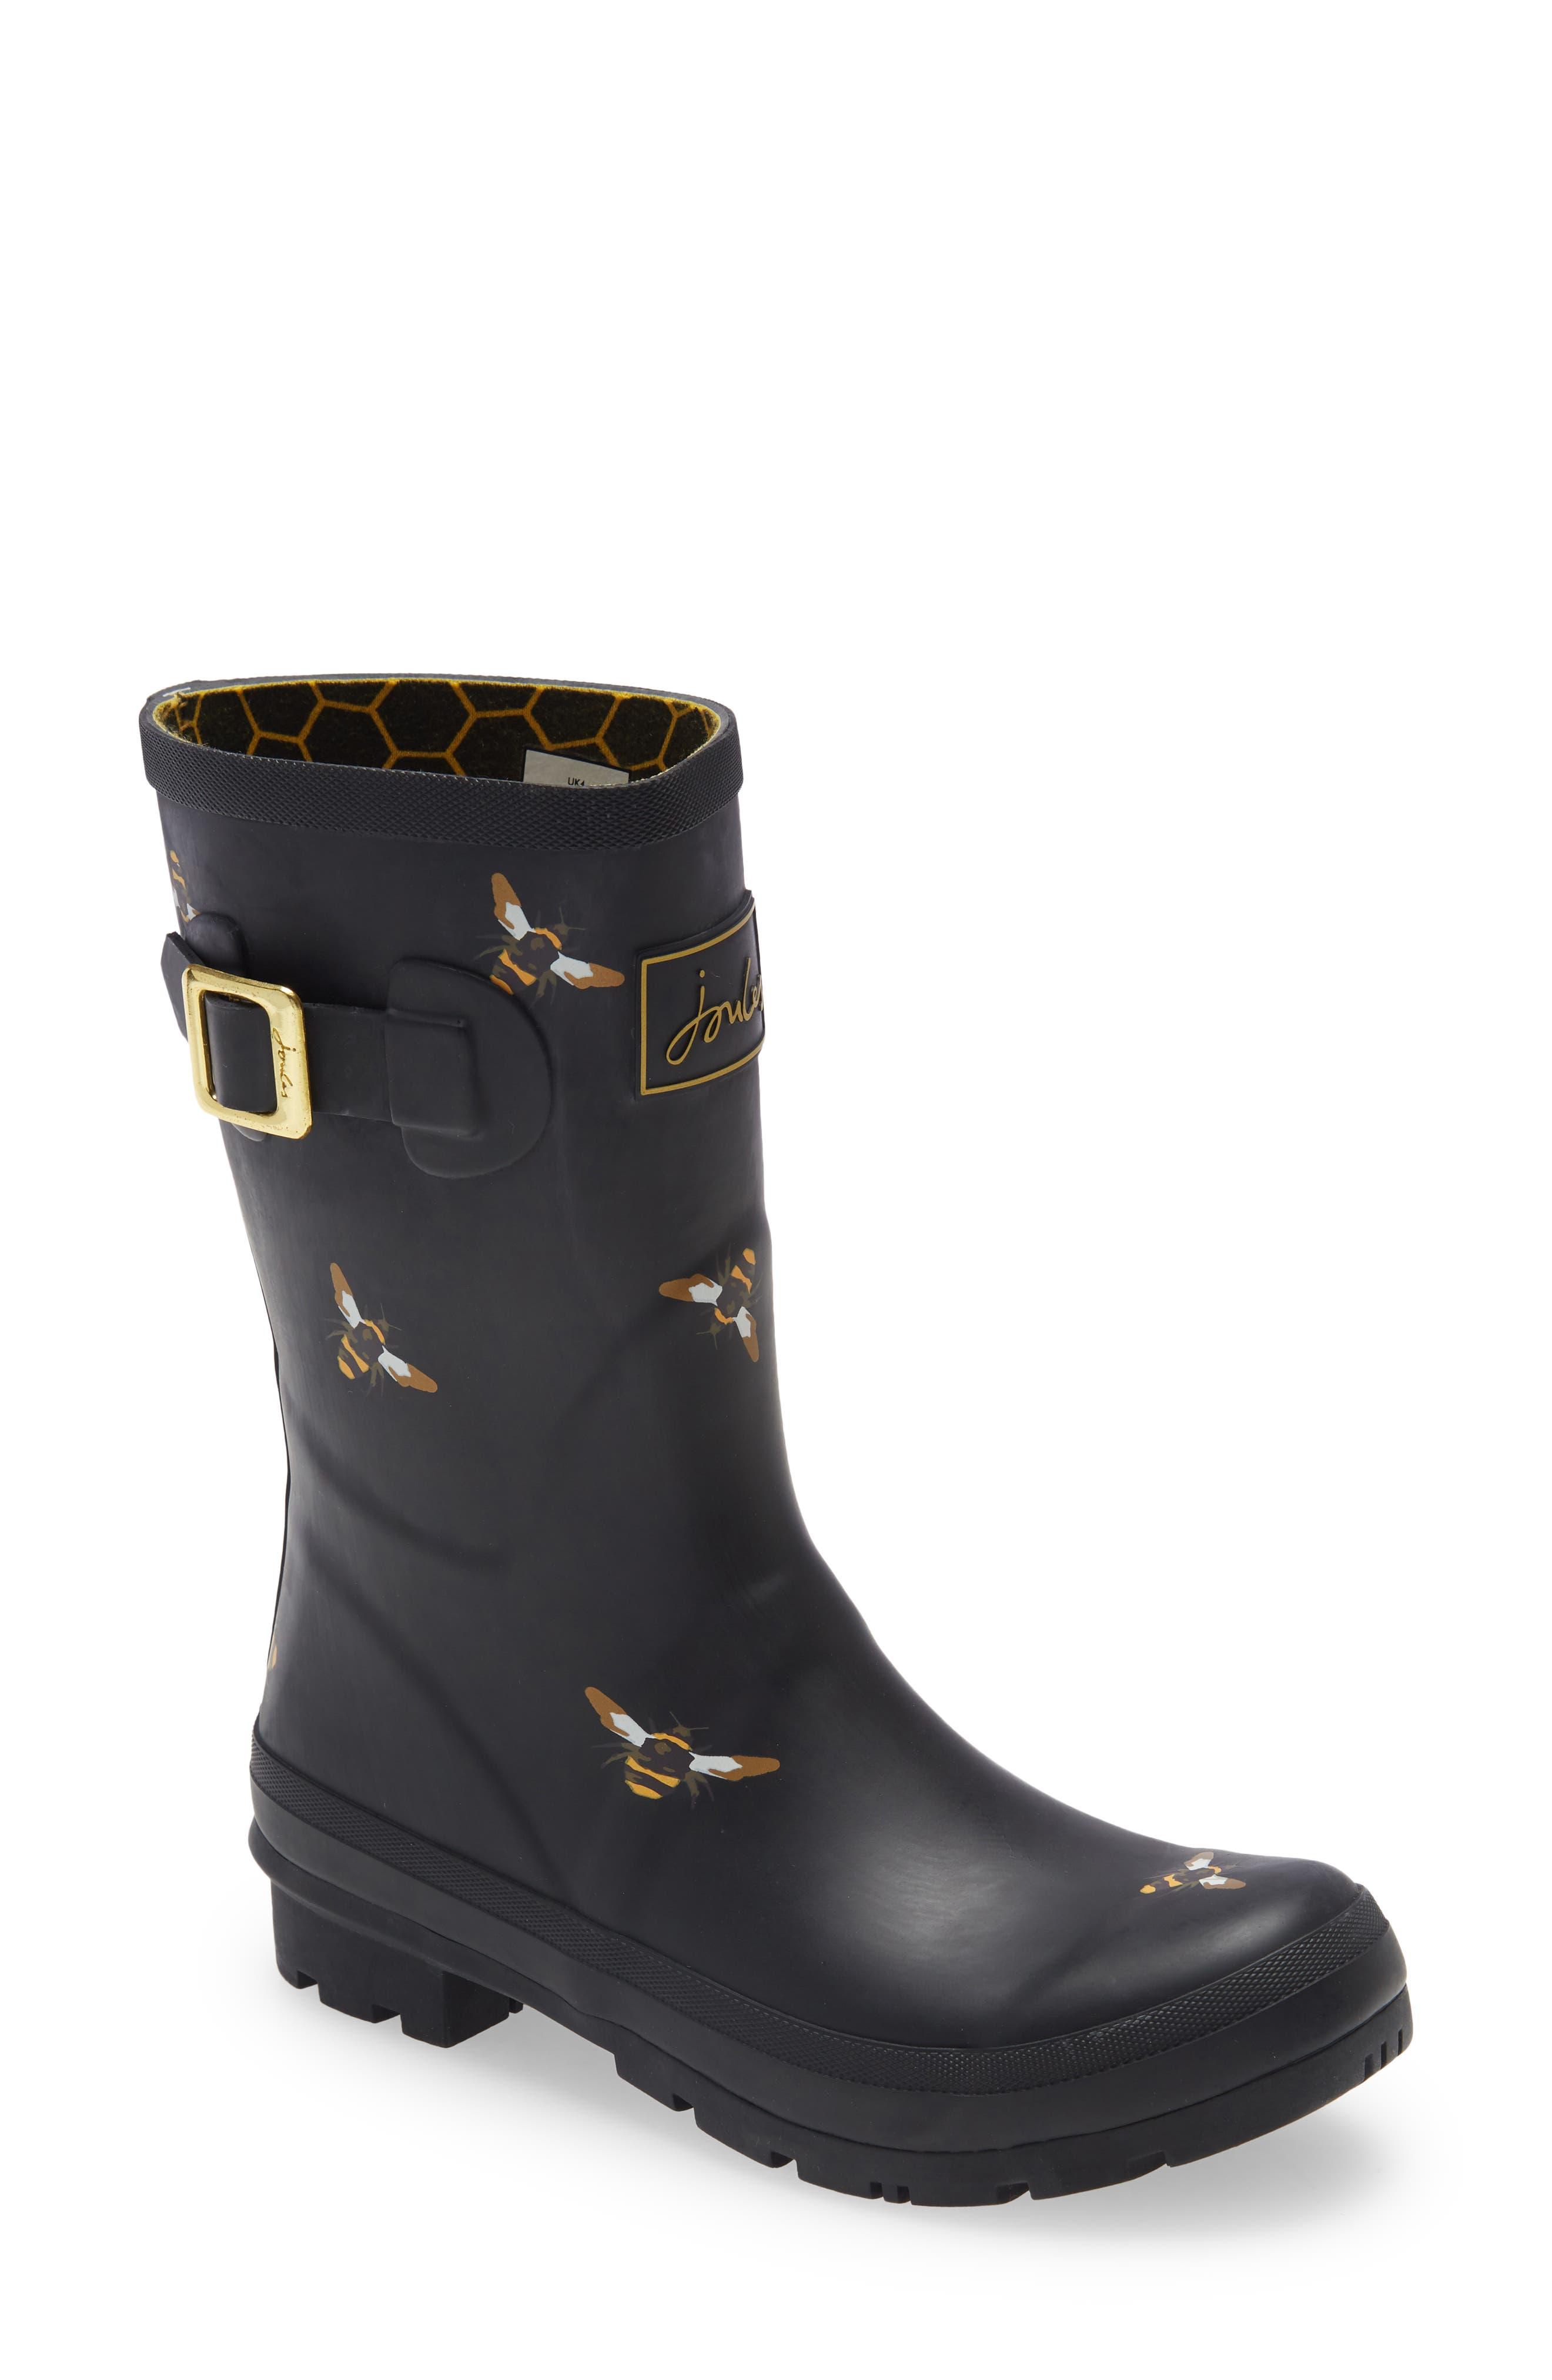 Molly Waterproof Rain Boot